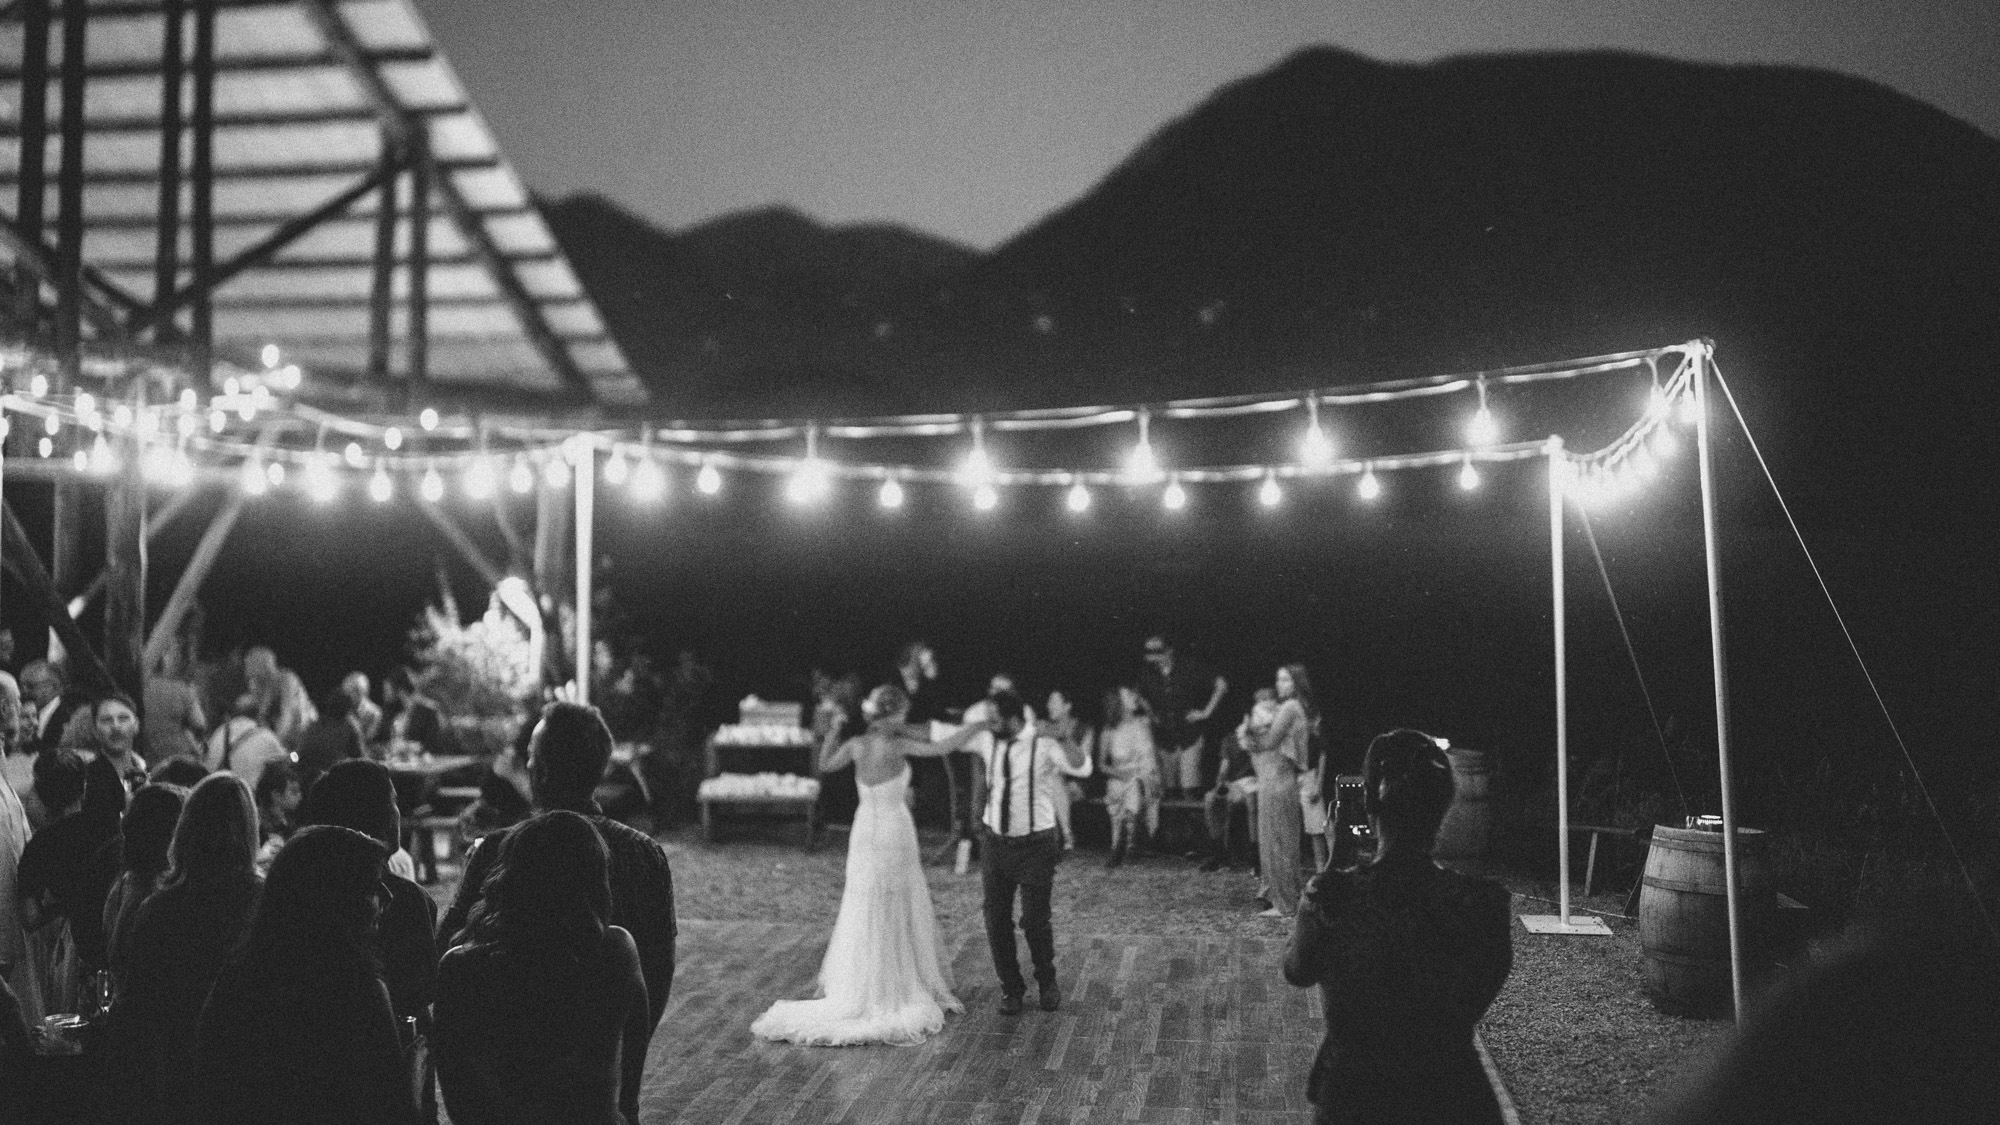 Montana_Wedding_Photos_alec_vanderboom-0144.jpg